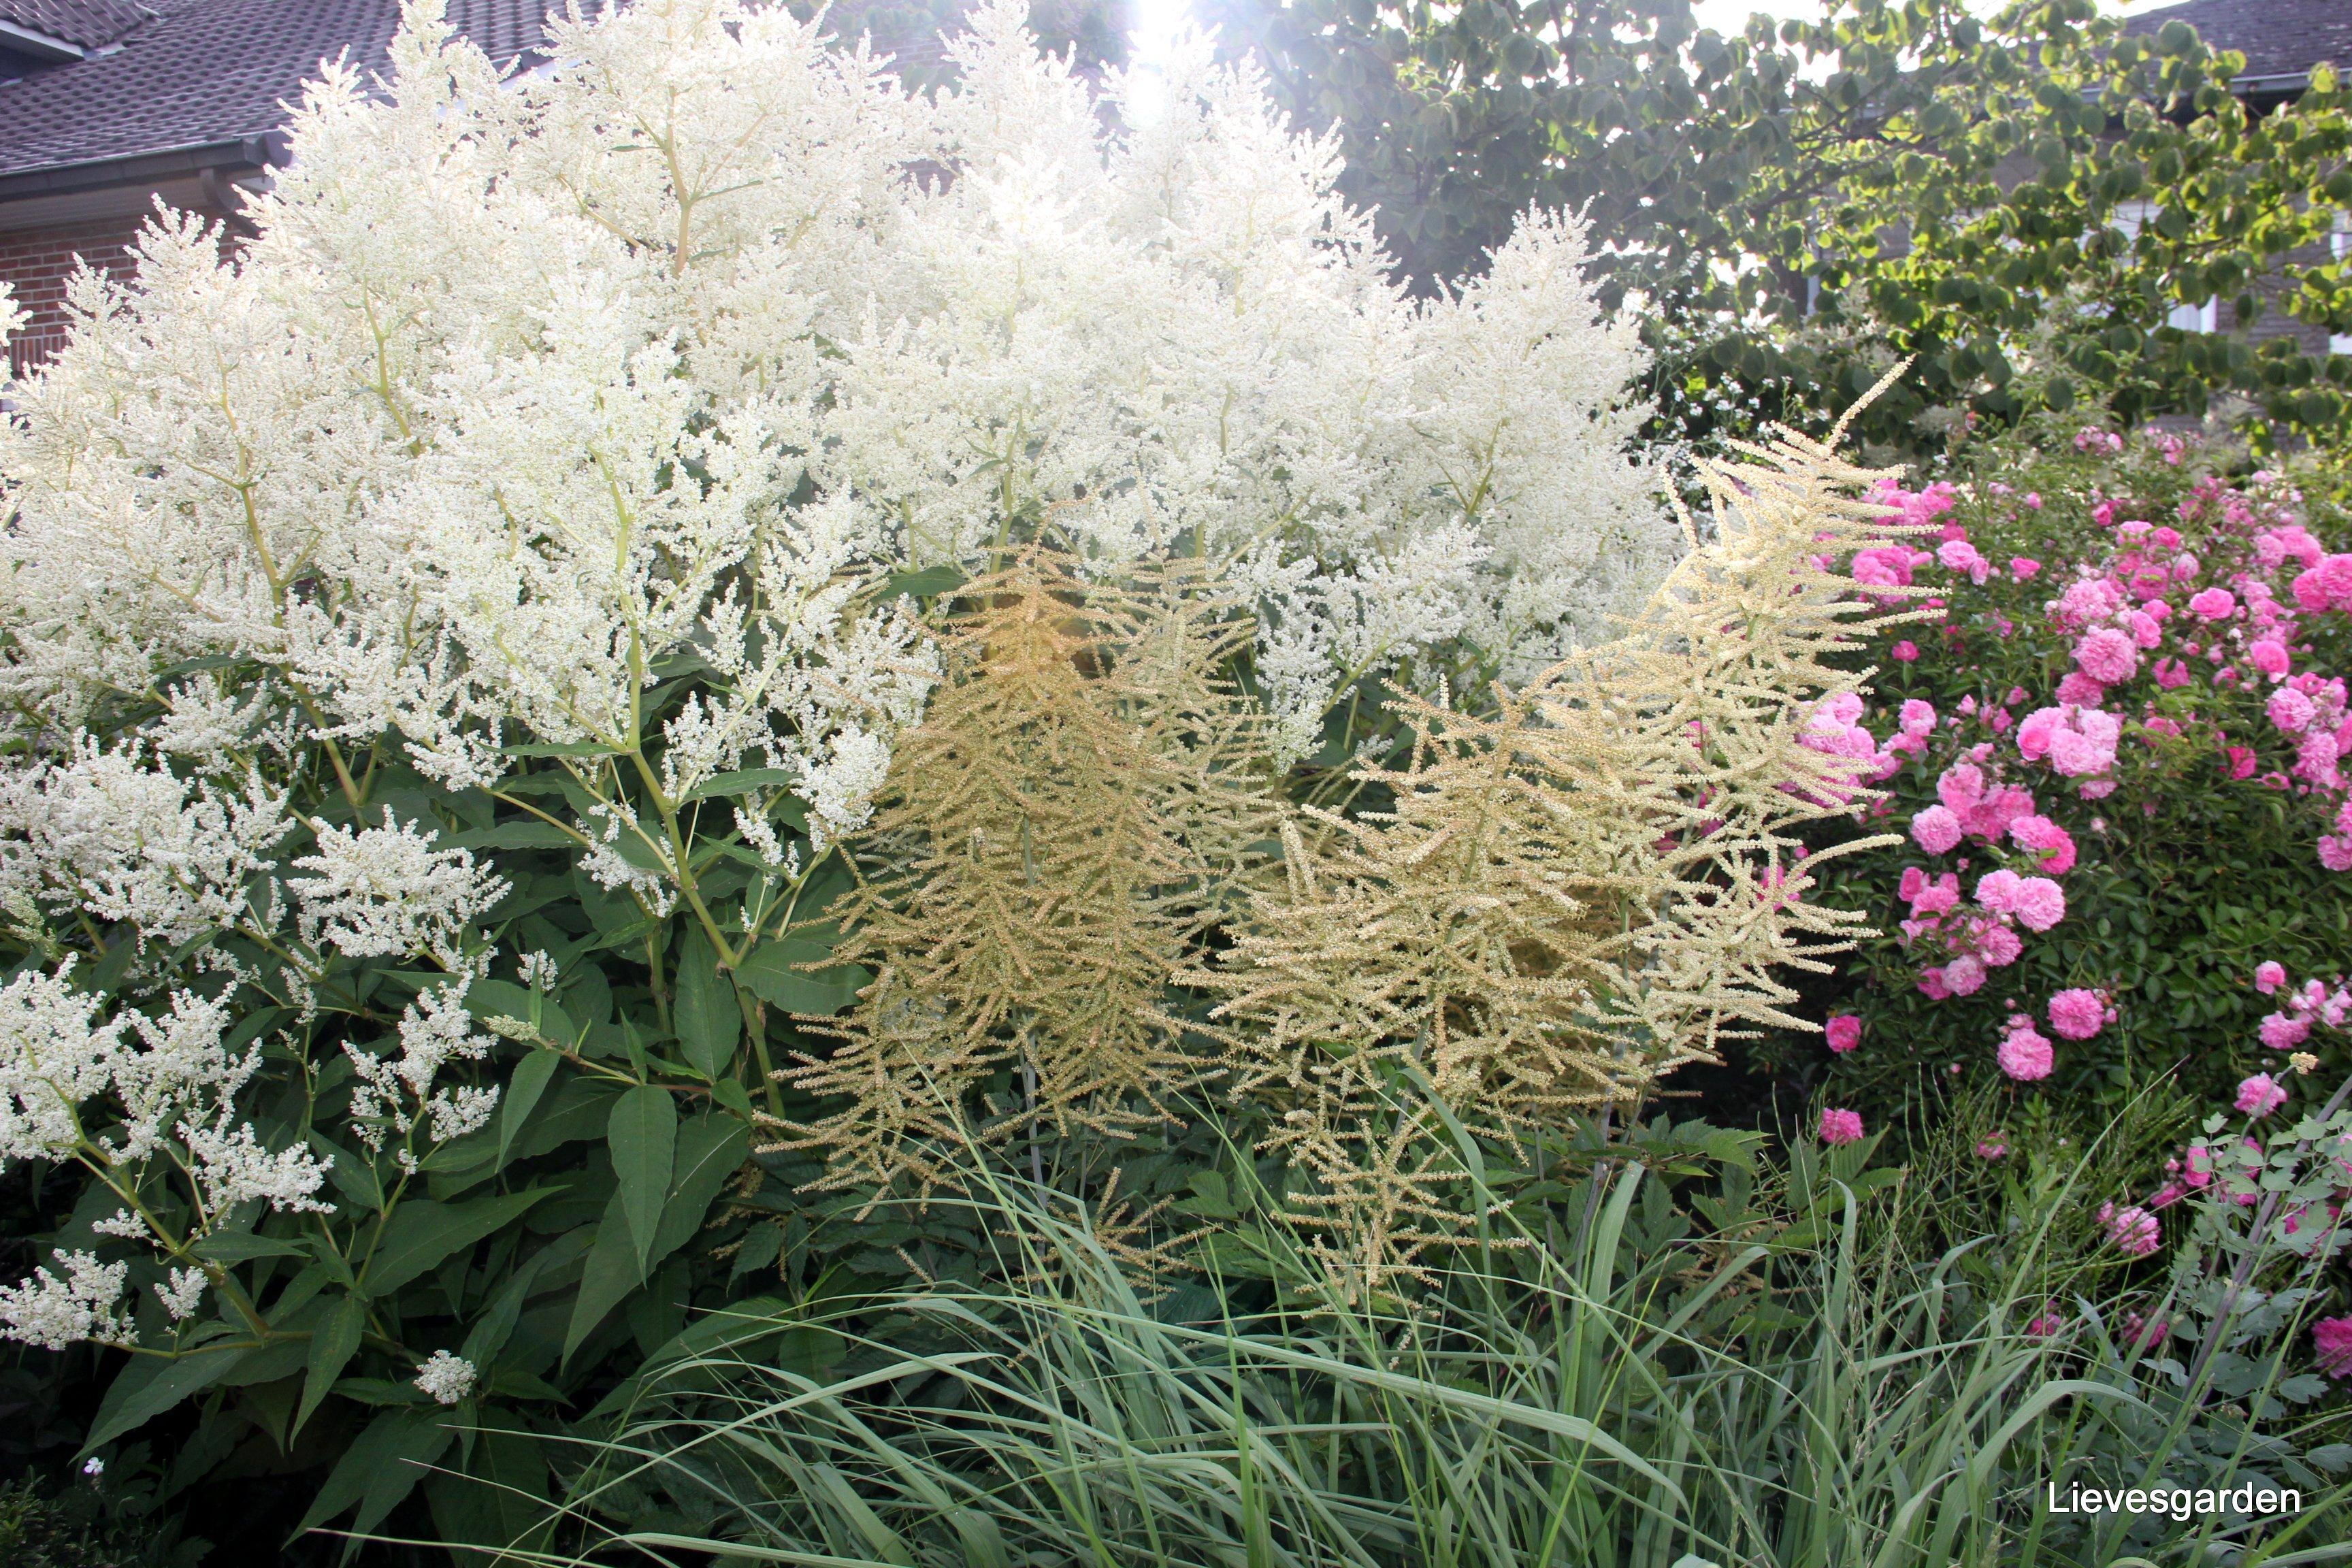 Aruncus en persicaria polymorpha mooie combinatie qua structure